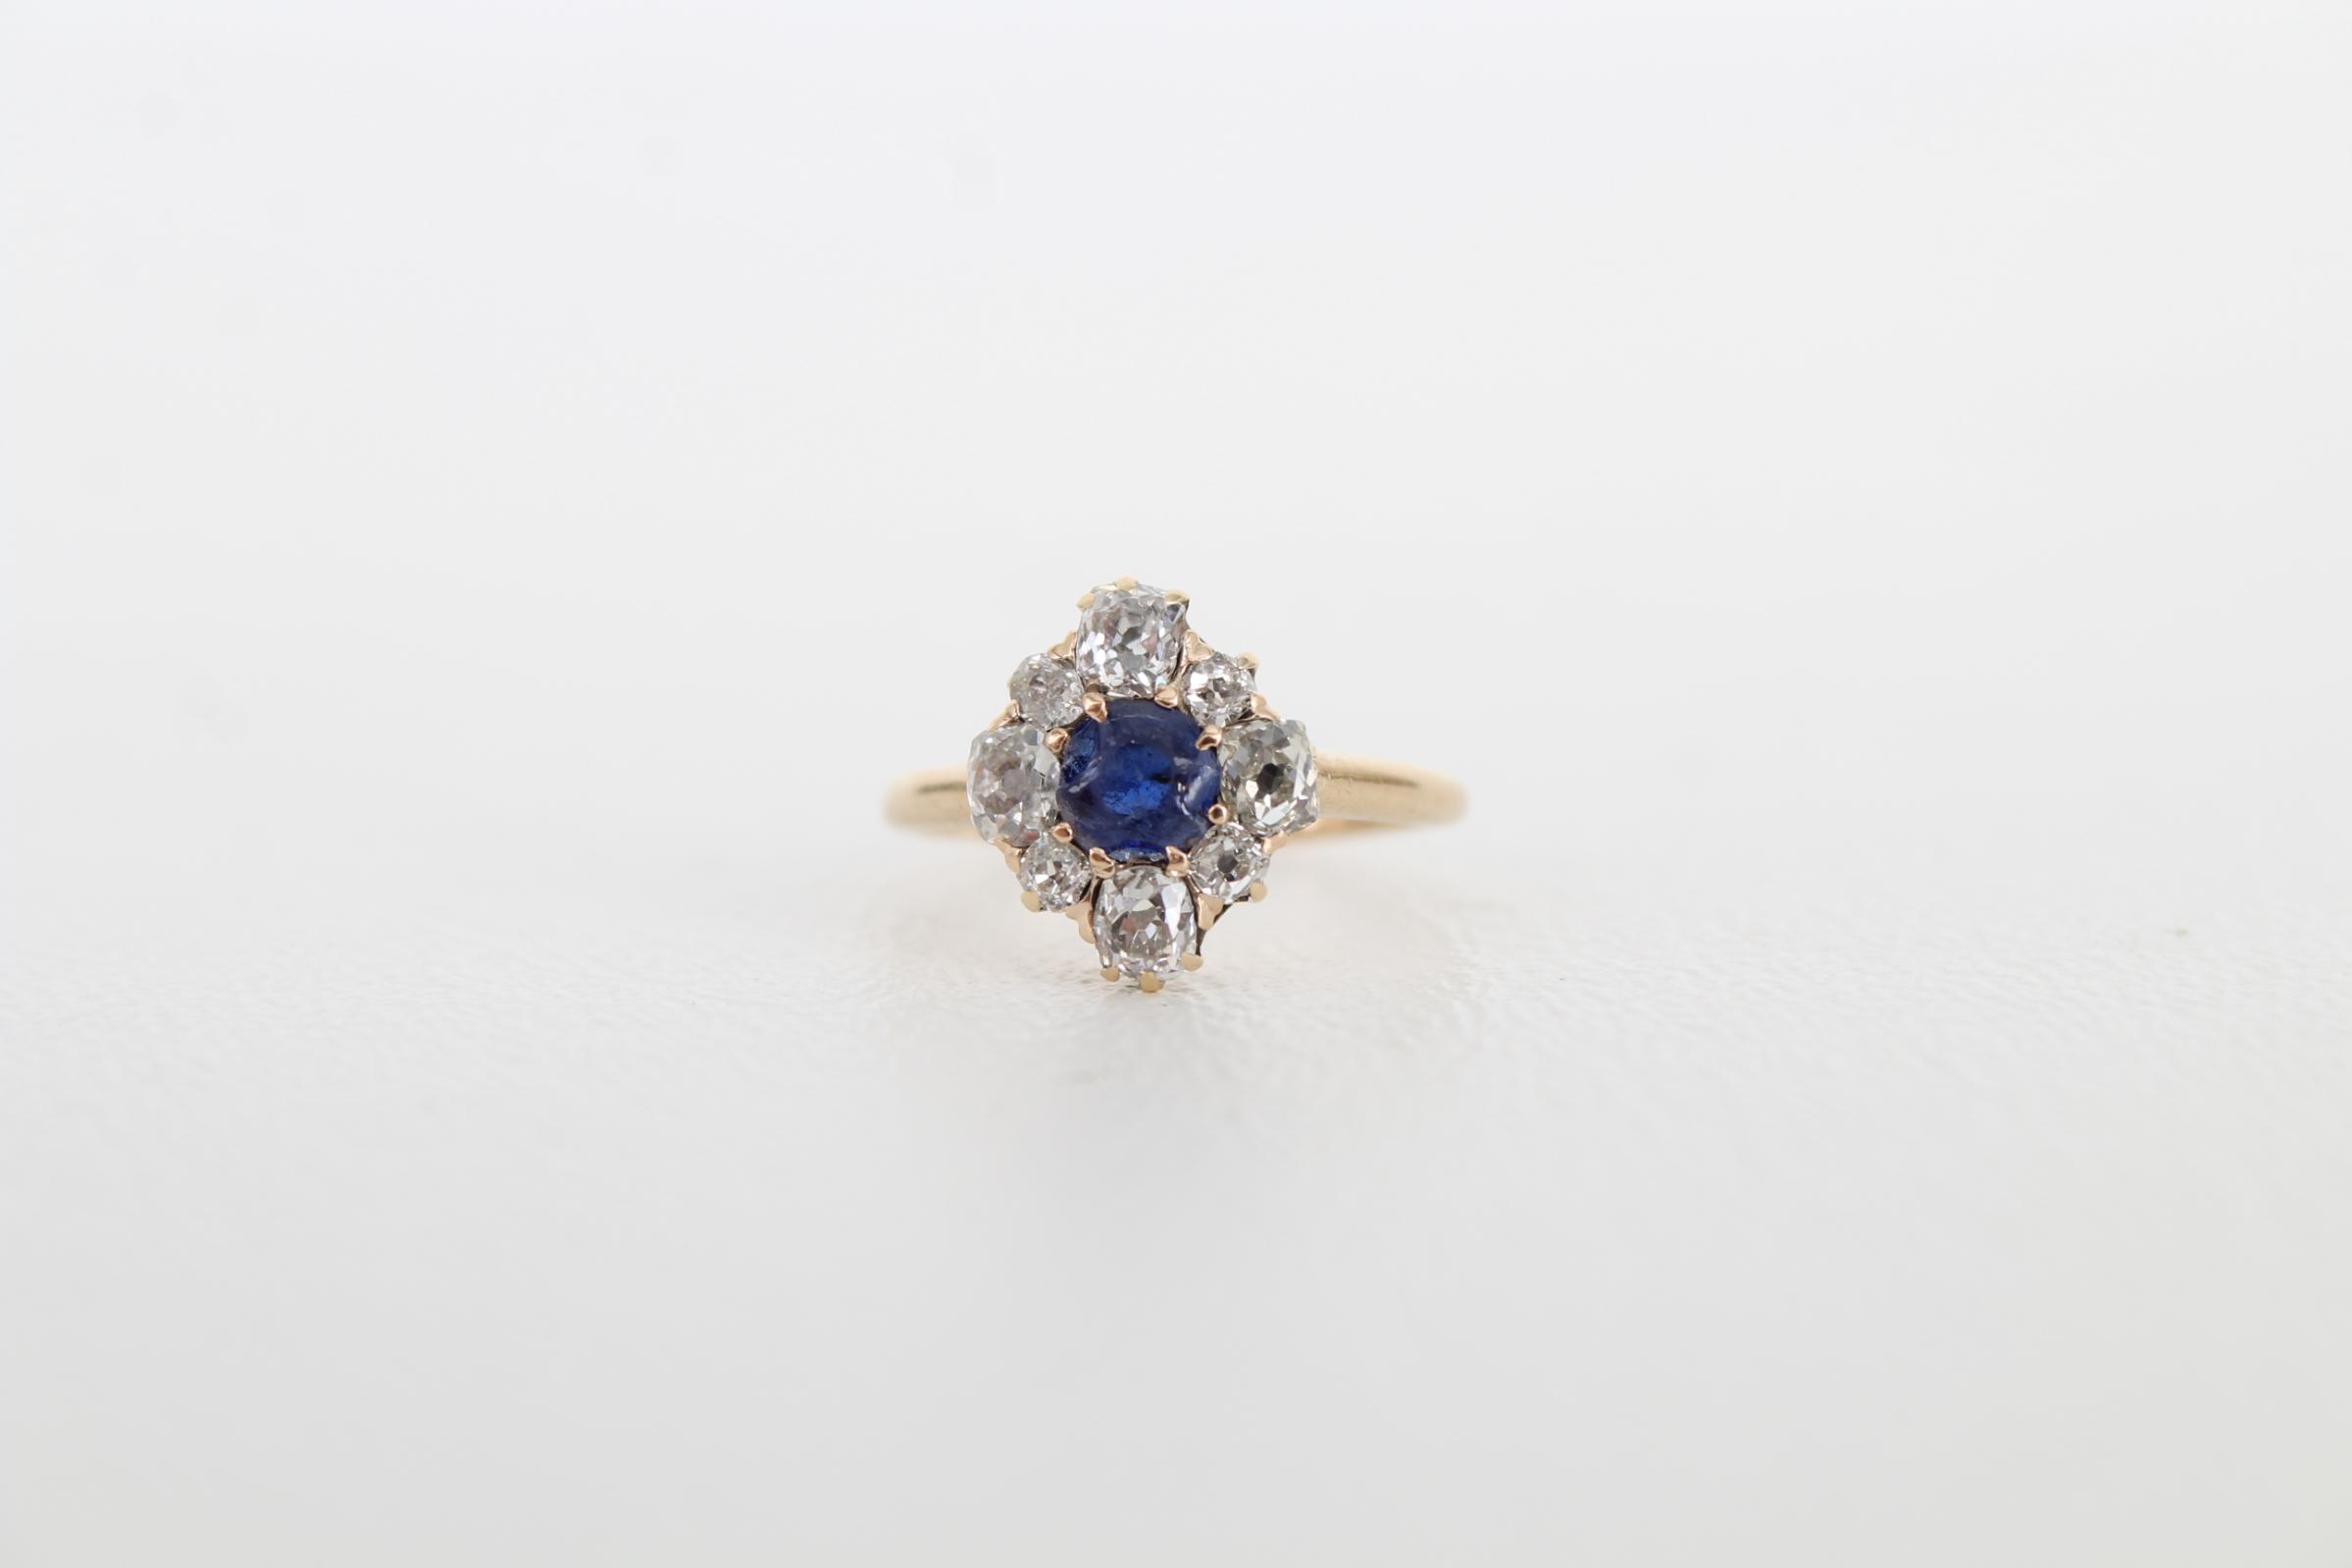 Sapphire & Diamond Petite Gold Ring - Image 2 of 6